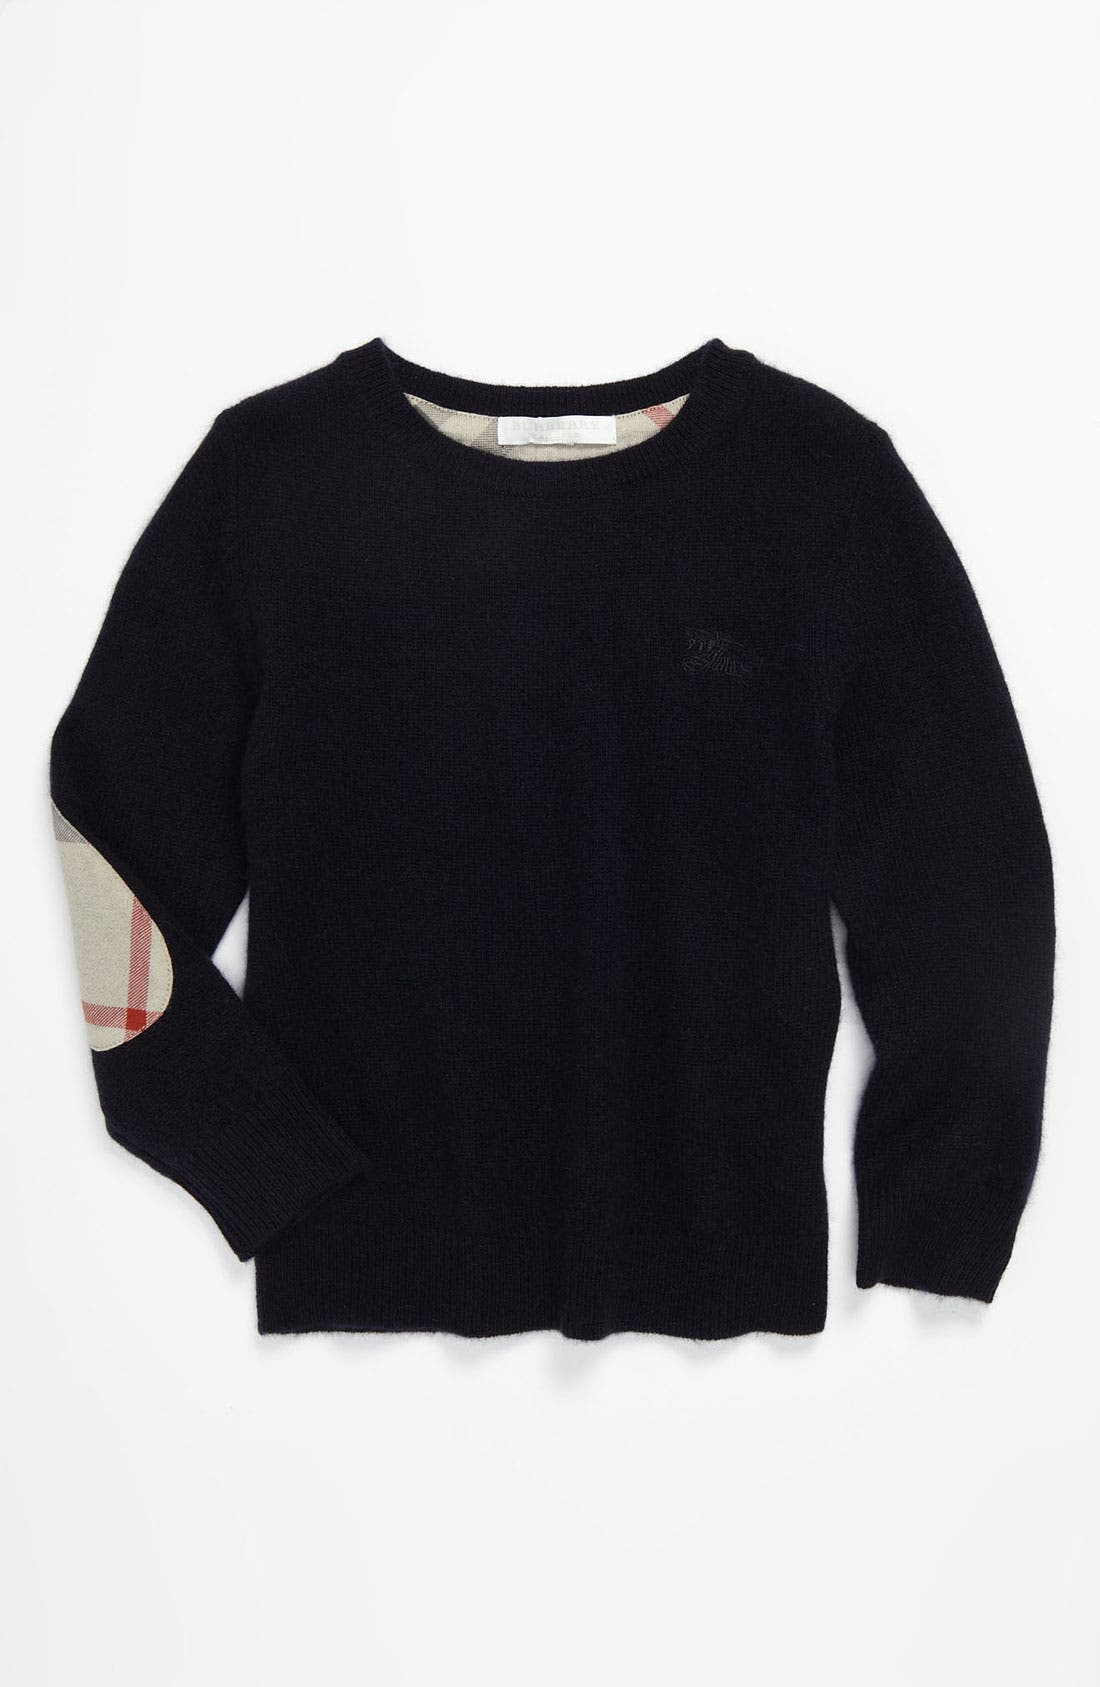 Alternate Image 1 Selected - Burberry Cashmere Sweater (Little Boys & Big Boys)